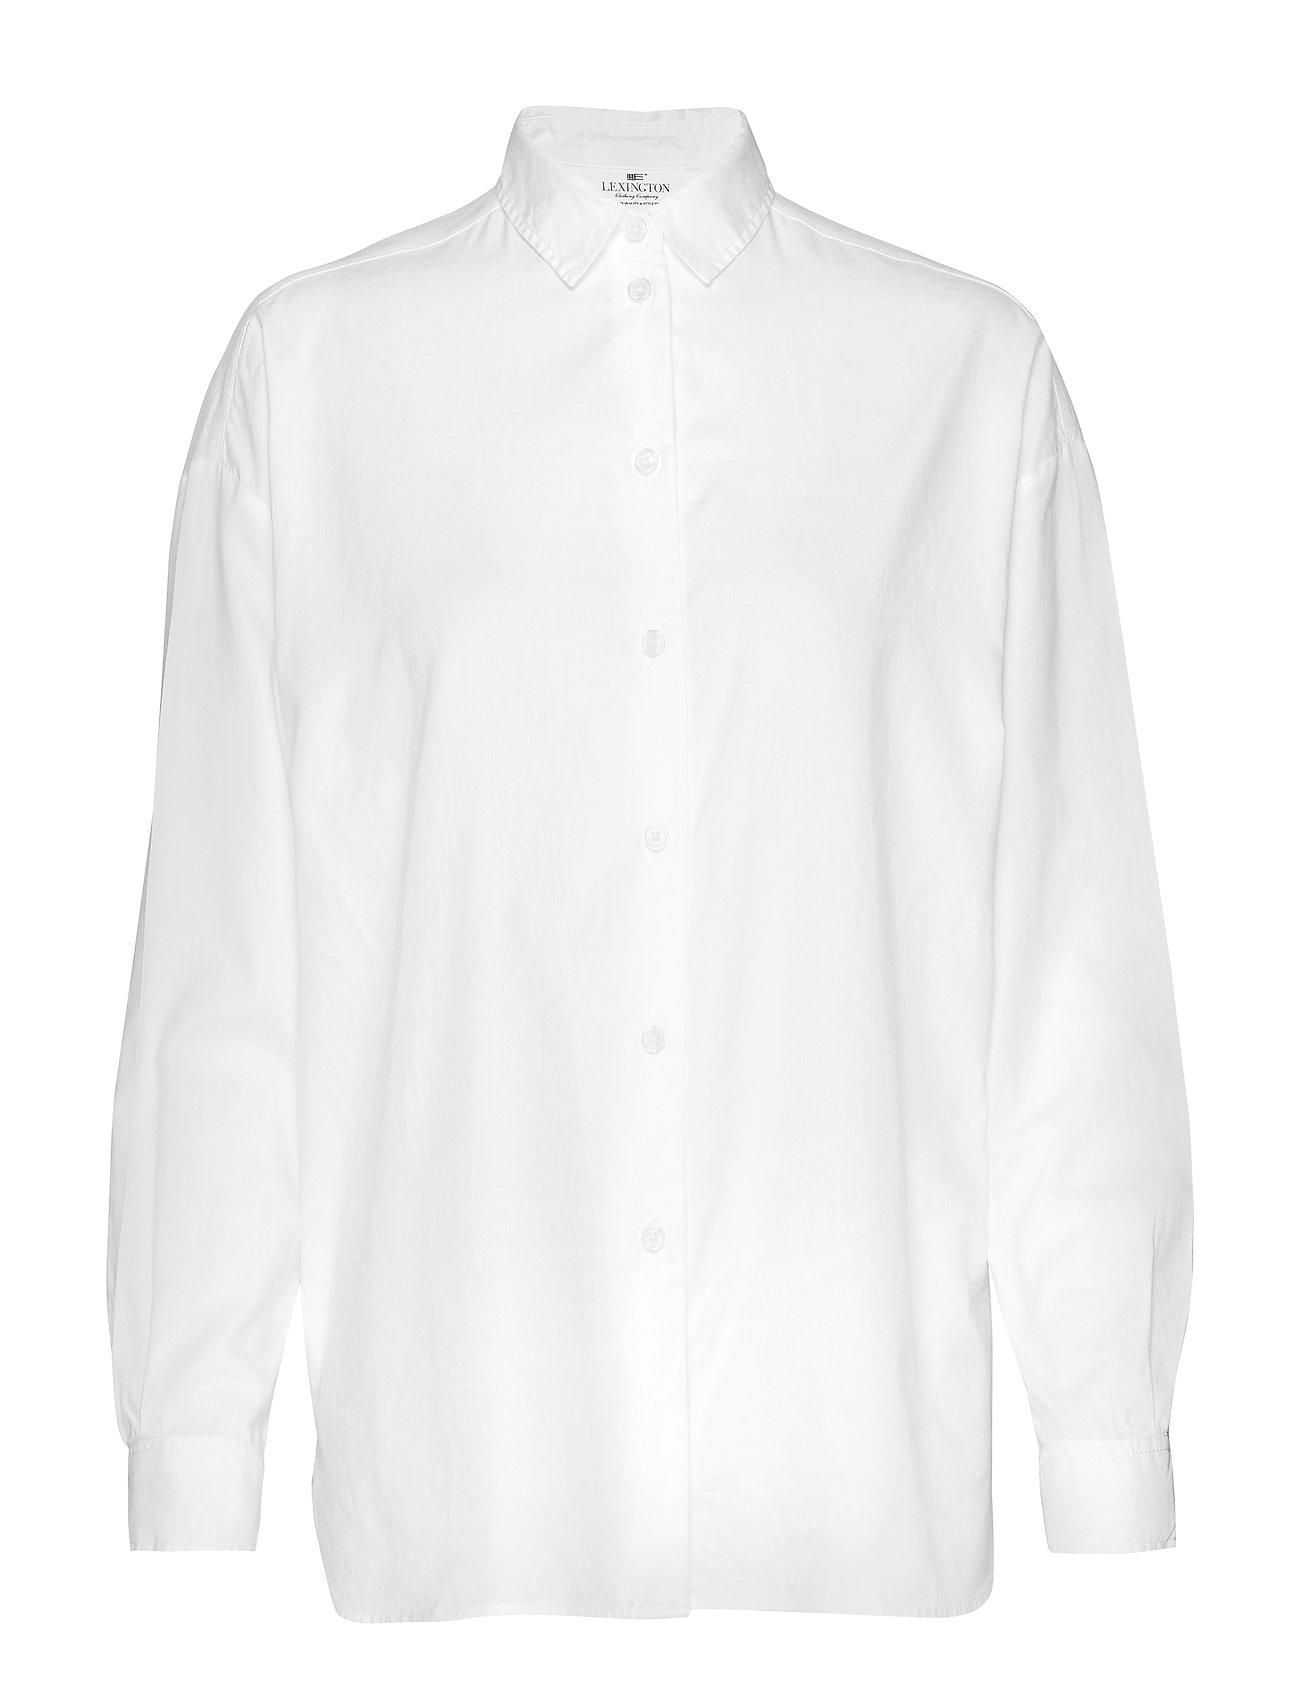 Lexington Clothing Edith Lt Oxford Shirt - WHITE